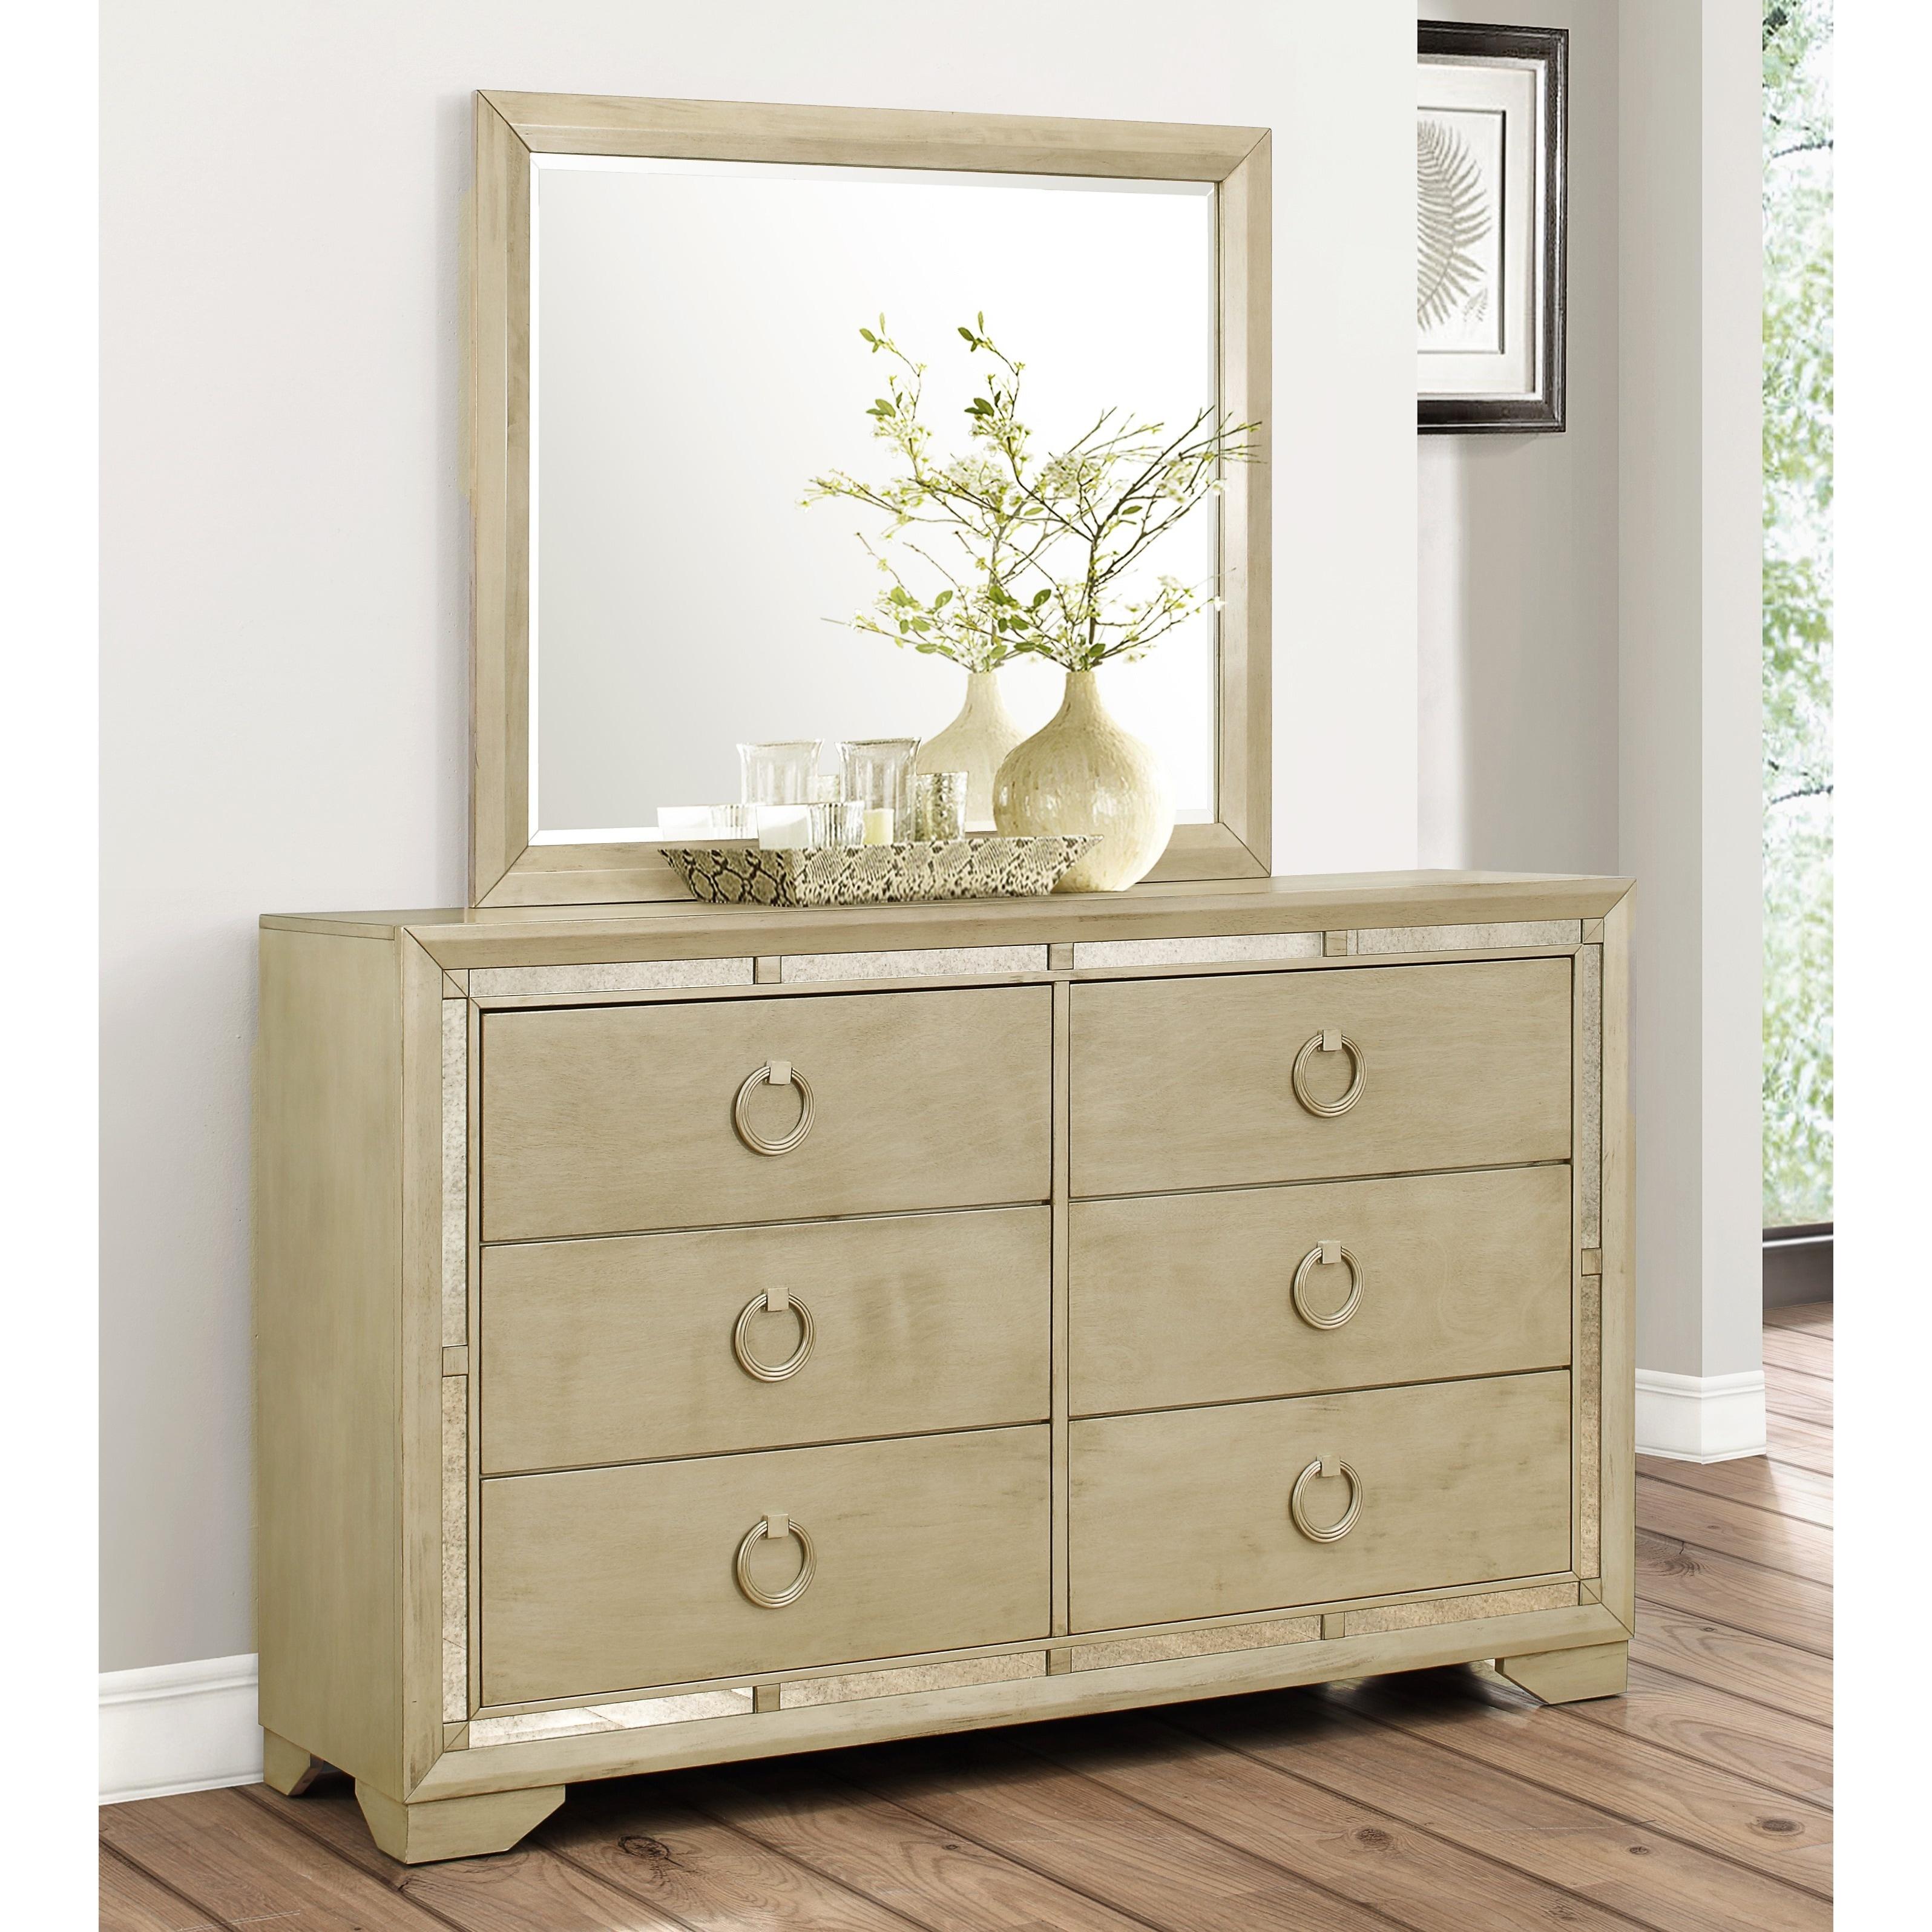 and stool acut table white itm set sienna dresser mirror dressing